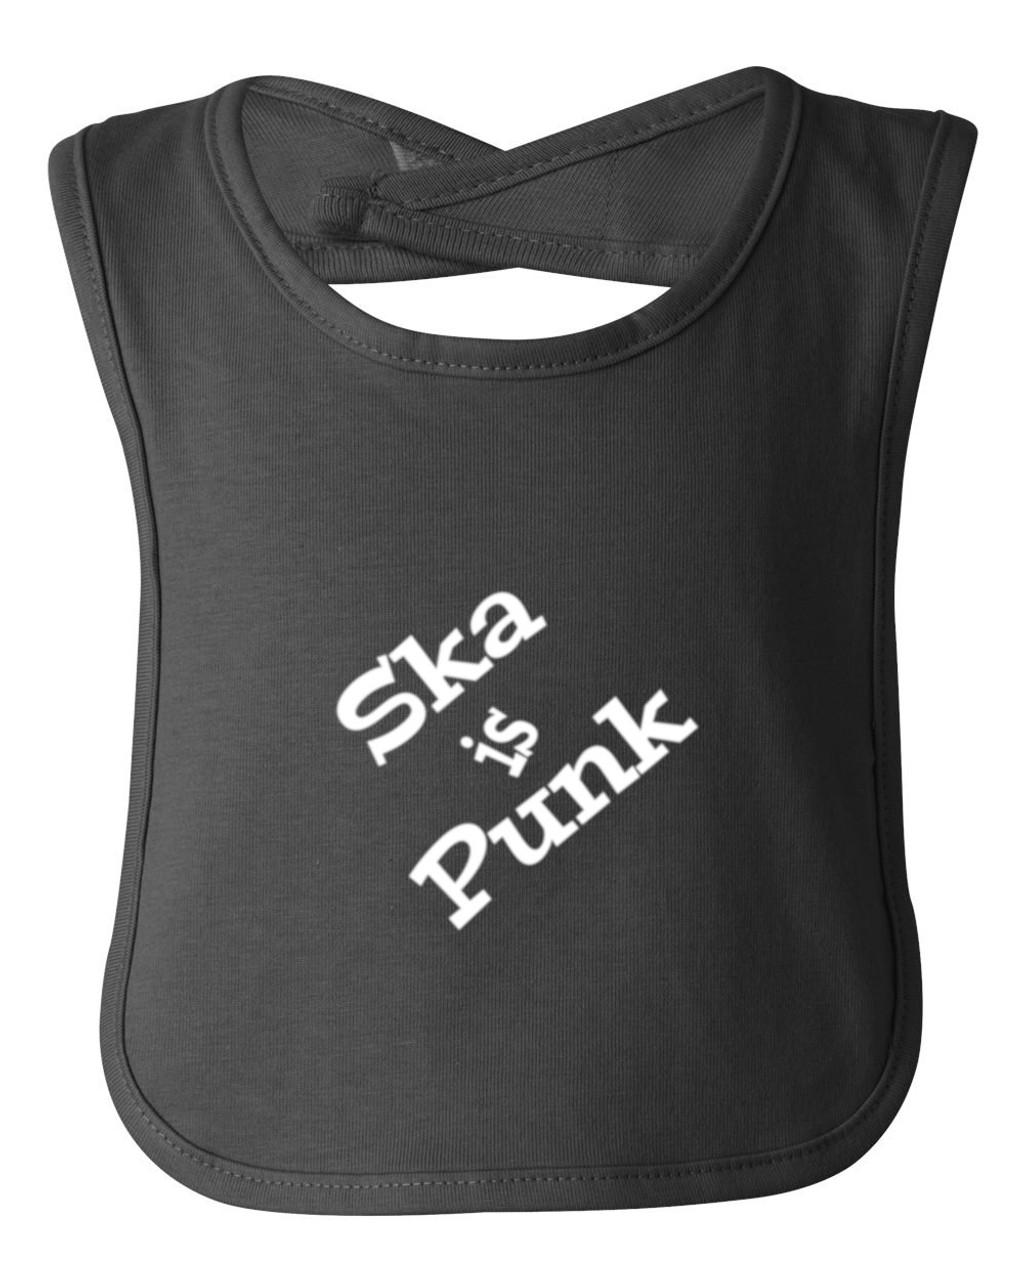 Ska is Punk Music Op Ivy Baby Bib Black Cotton Child Apron & Smock